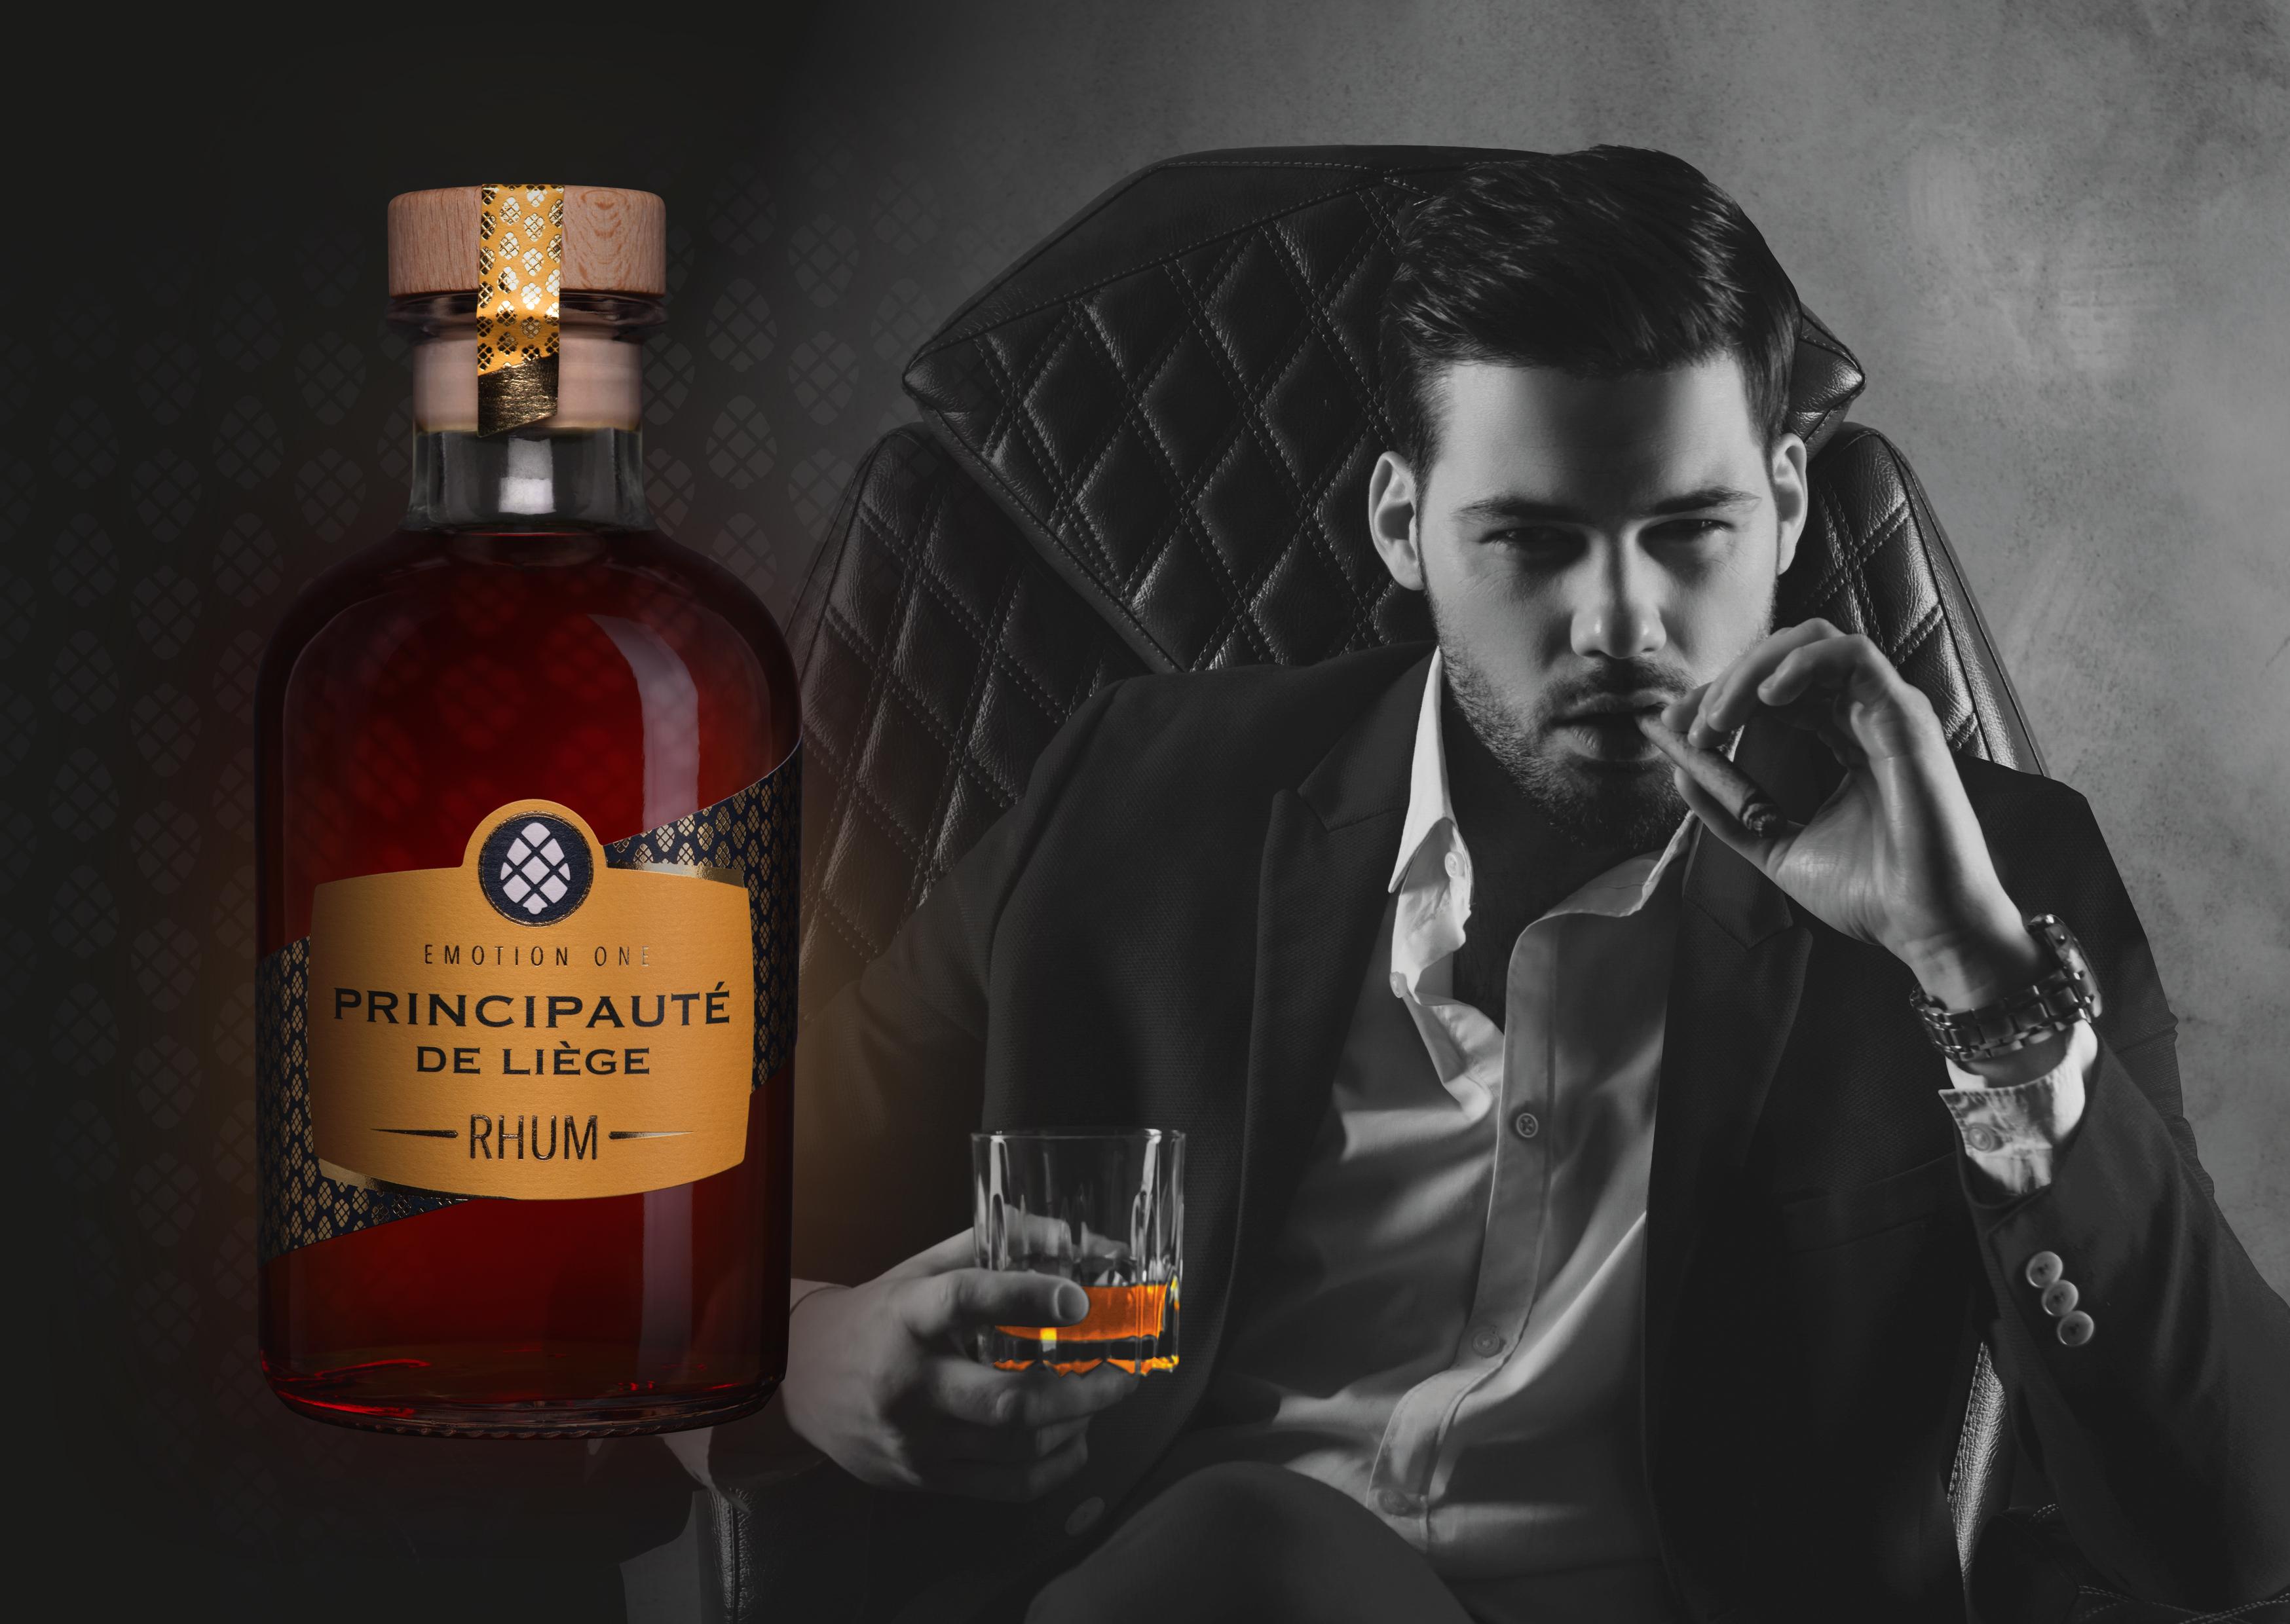 Le gin Rebel One Principauté de Liège